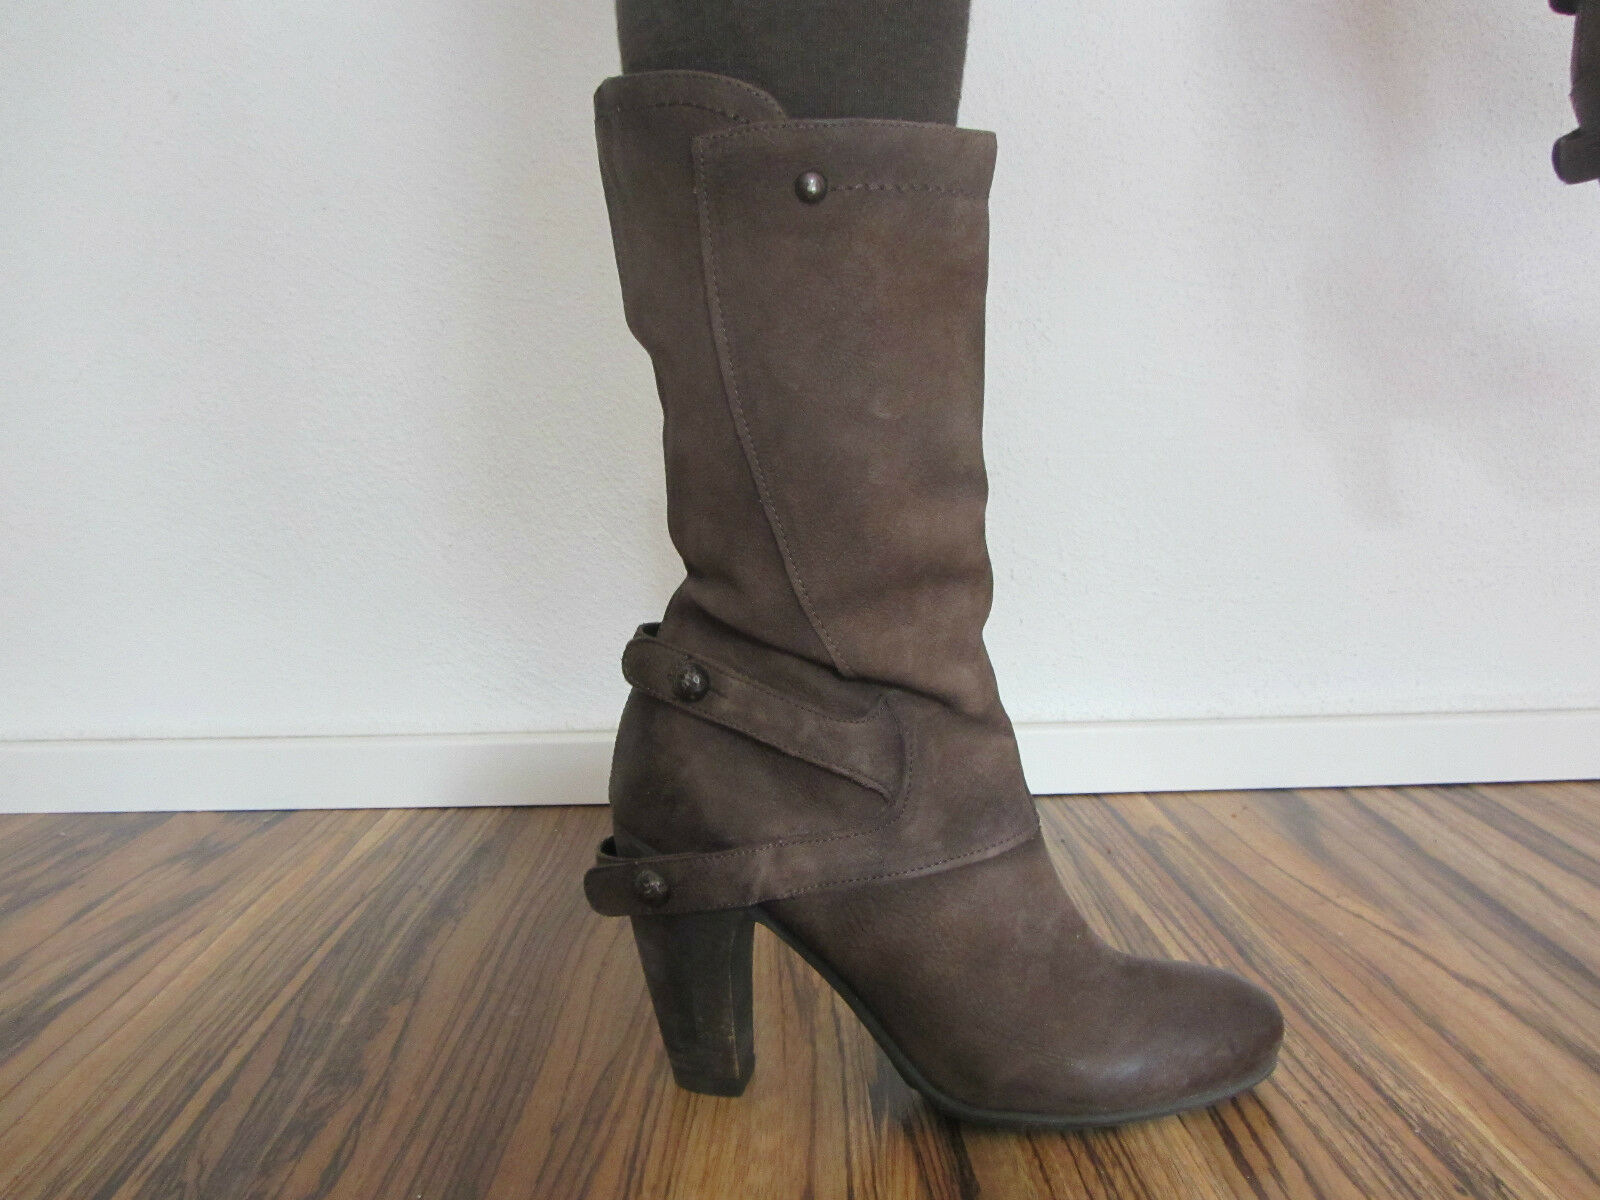 MJUS  Stiefel Leder  Gr. 38  Leder Stiefel Stiefeletten Stiefelette b7ce2d